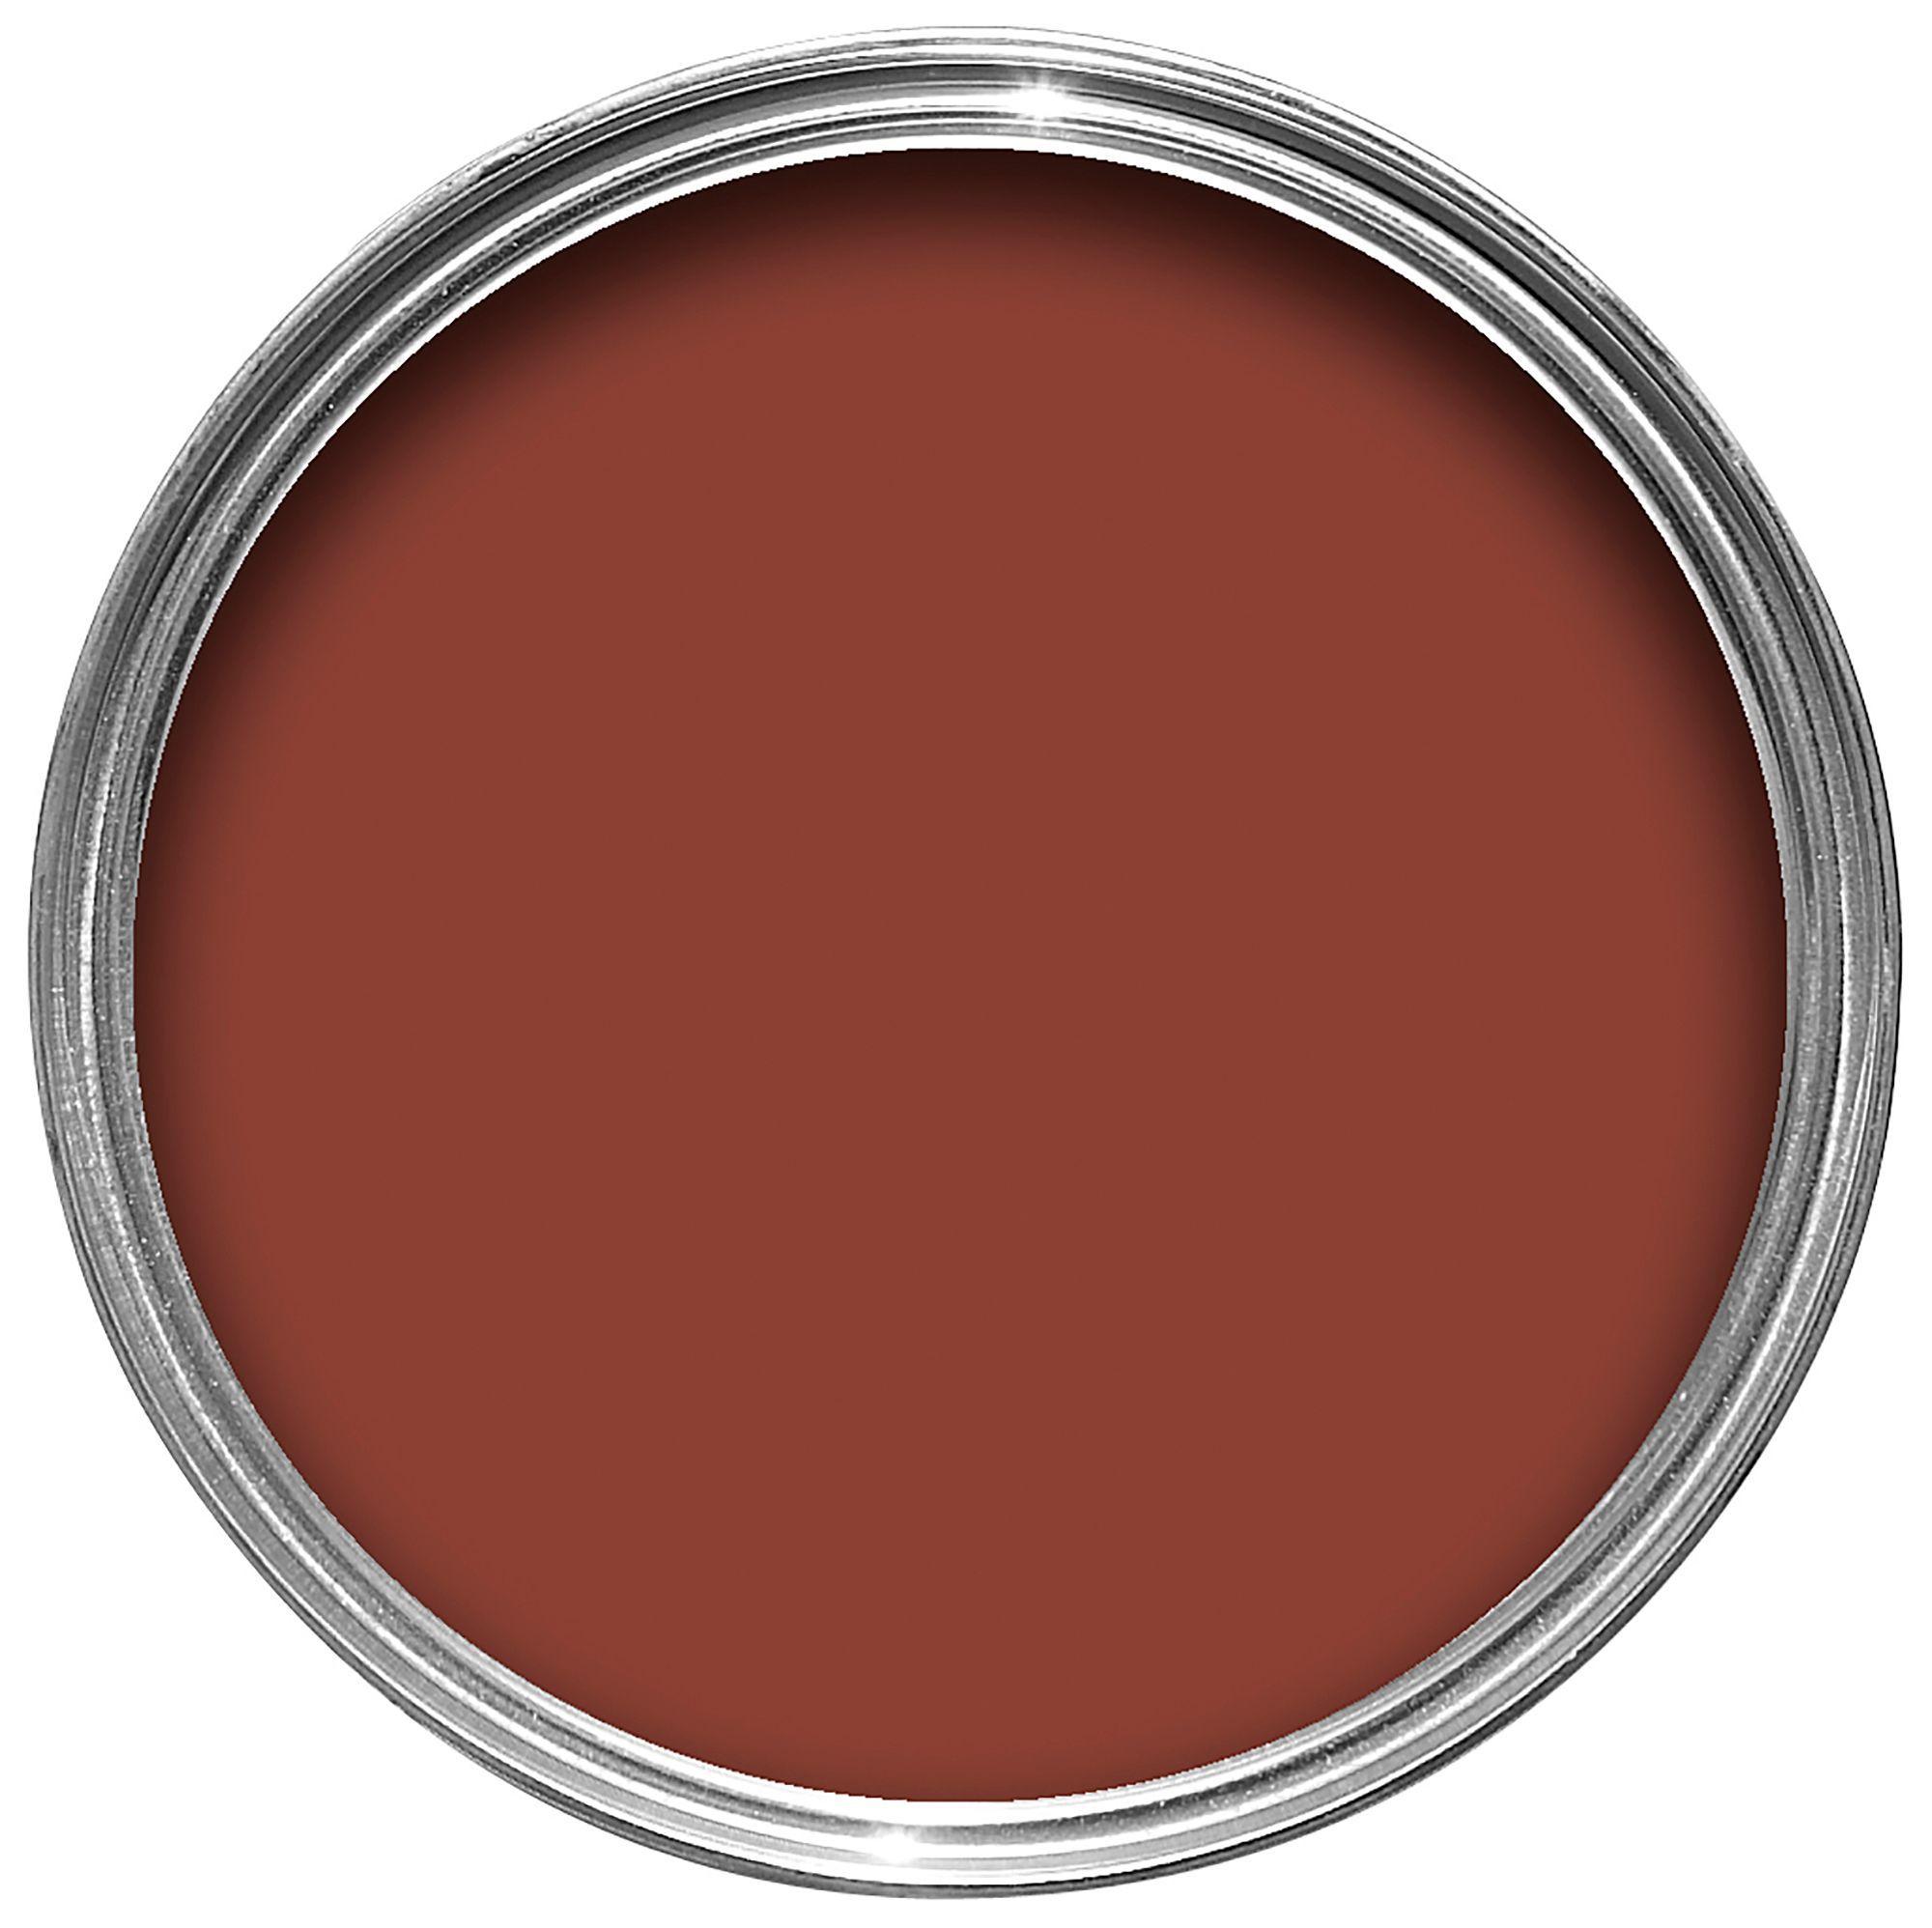 Colours brick red textured matt masonry paint 2 5l departments diy at b q - Exterior textured masonry paint model ...